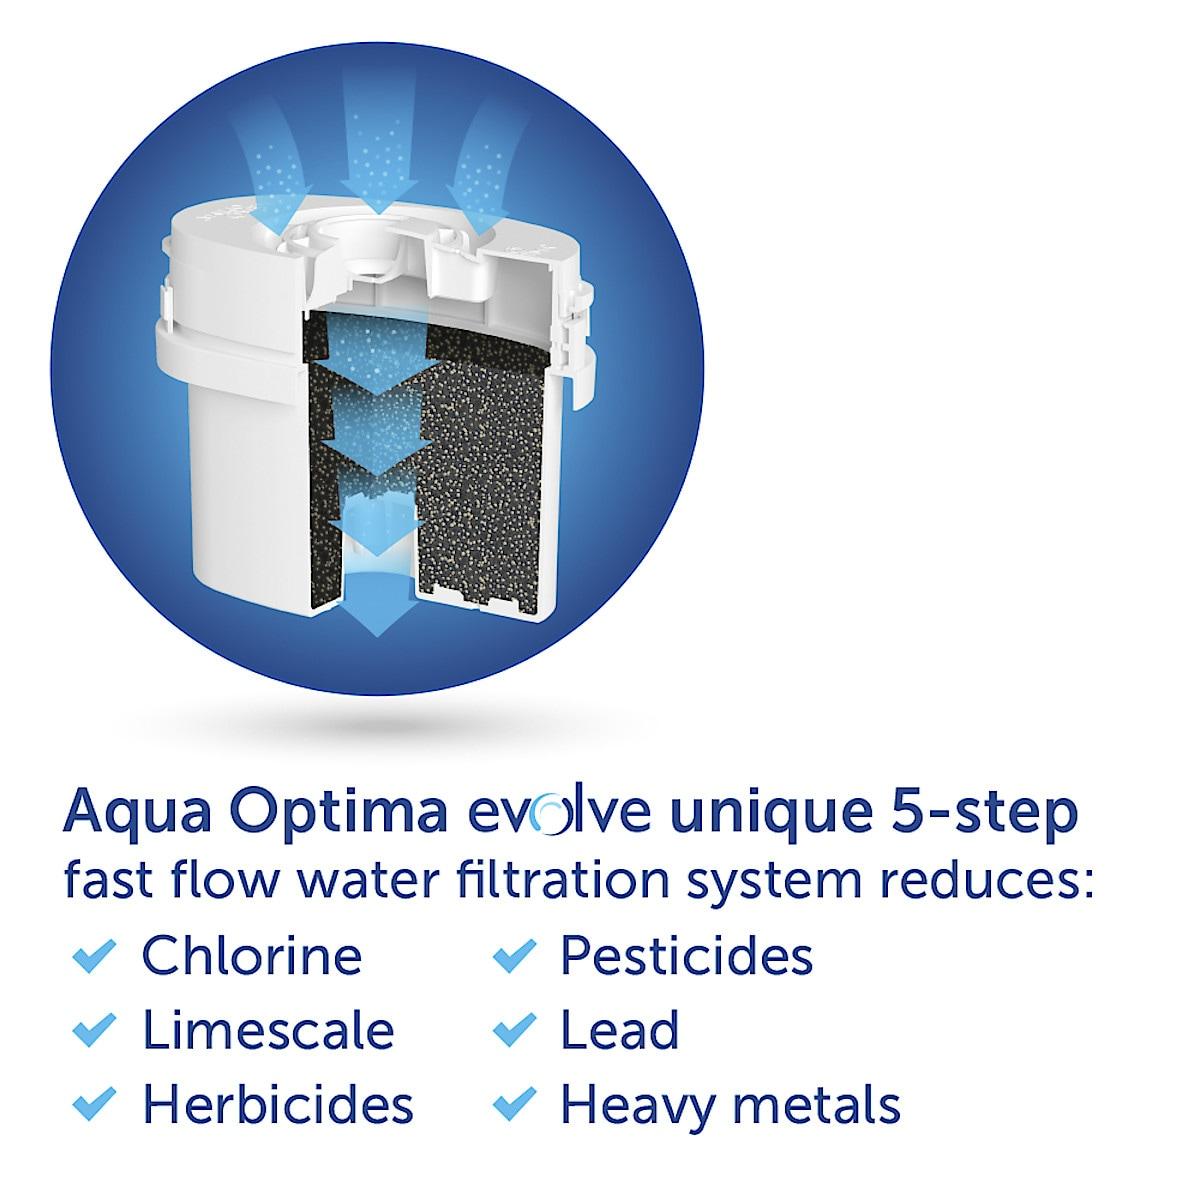 Aqua Optima Evolve Water Filter Cartridge 6-pack